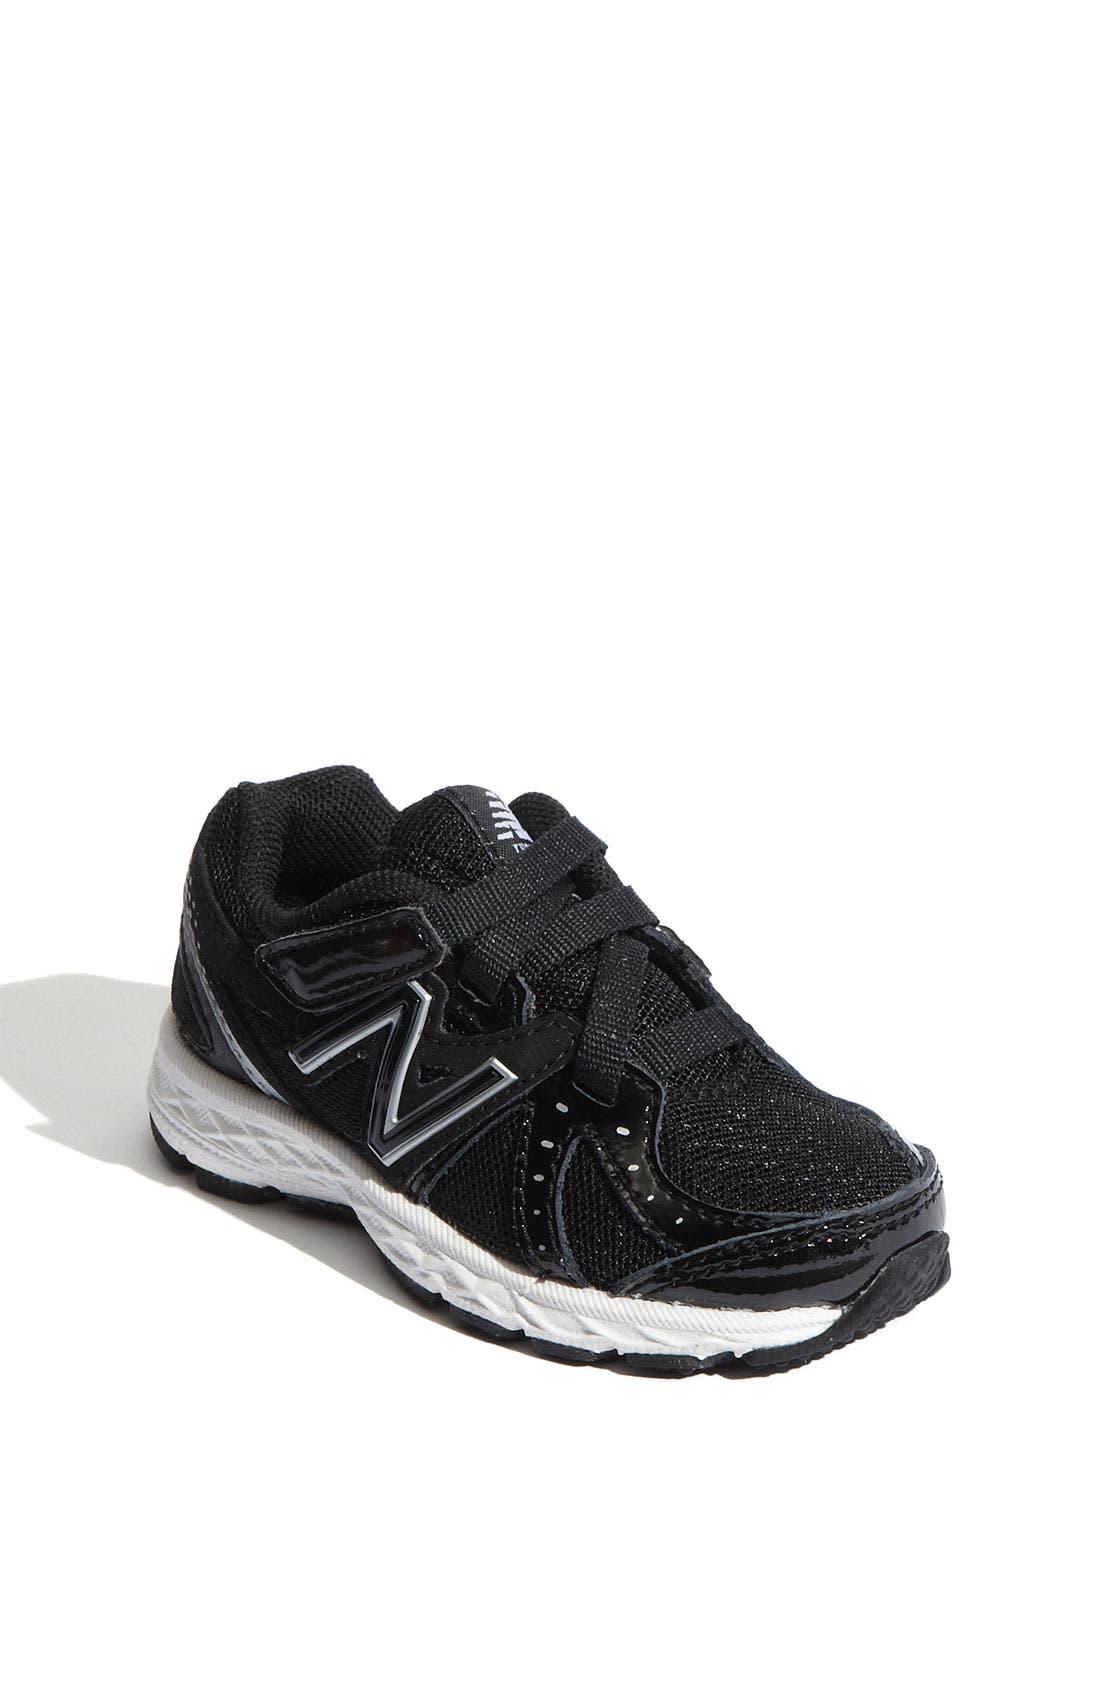 Main Image - New Balance '790' Running Shoe (Baby, Walker & Toddler)